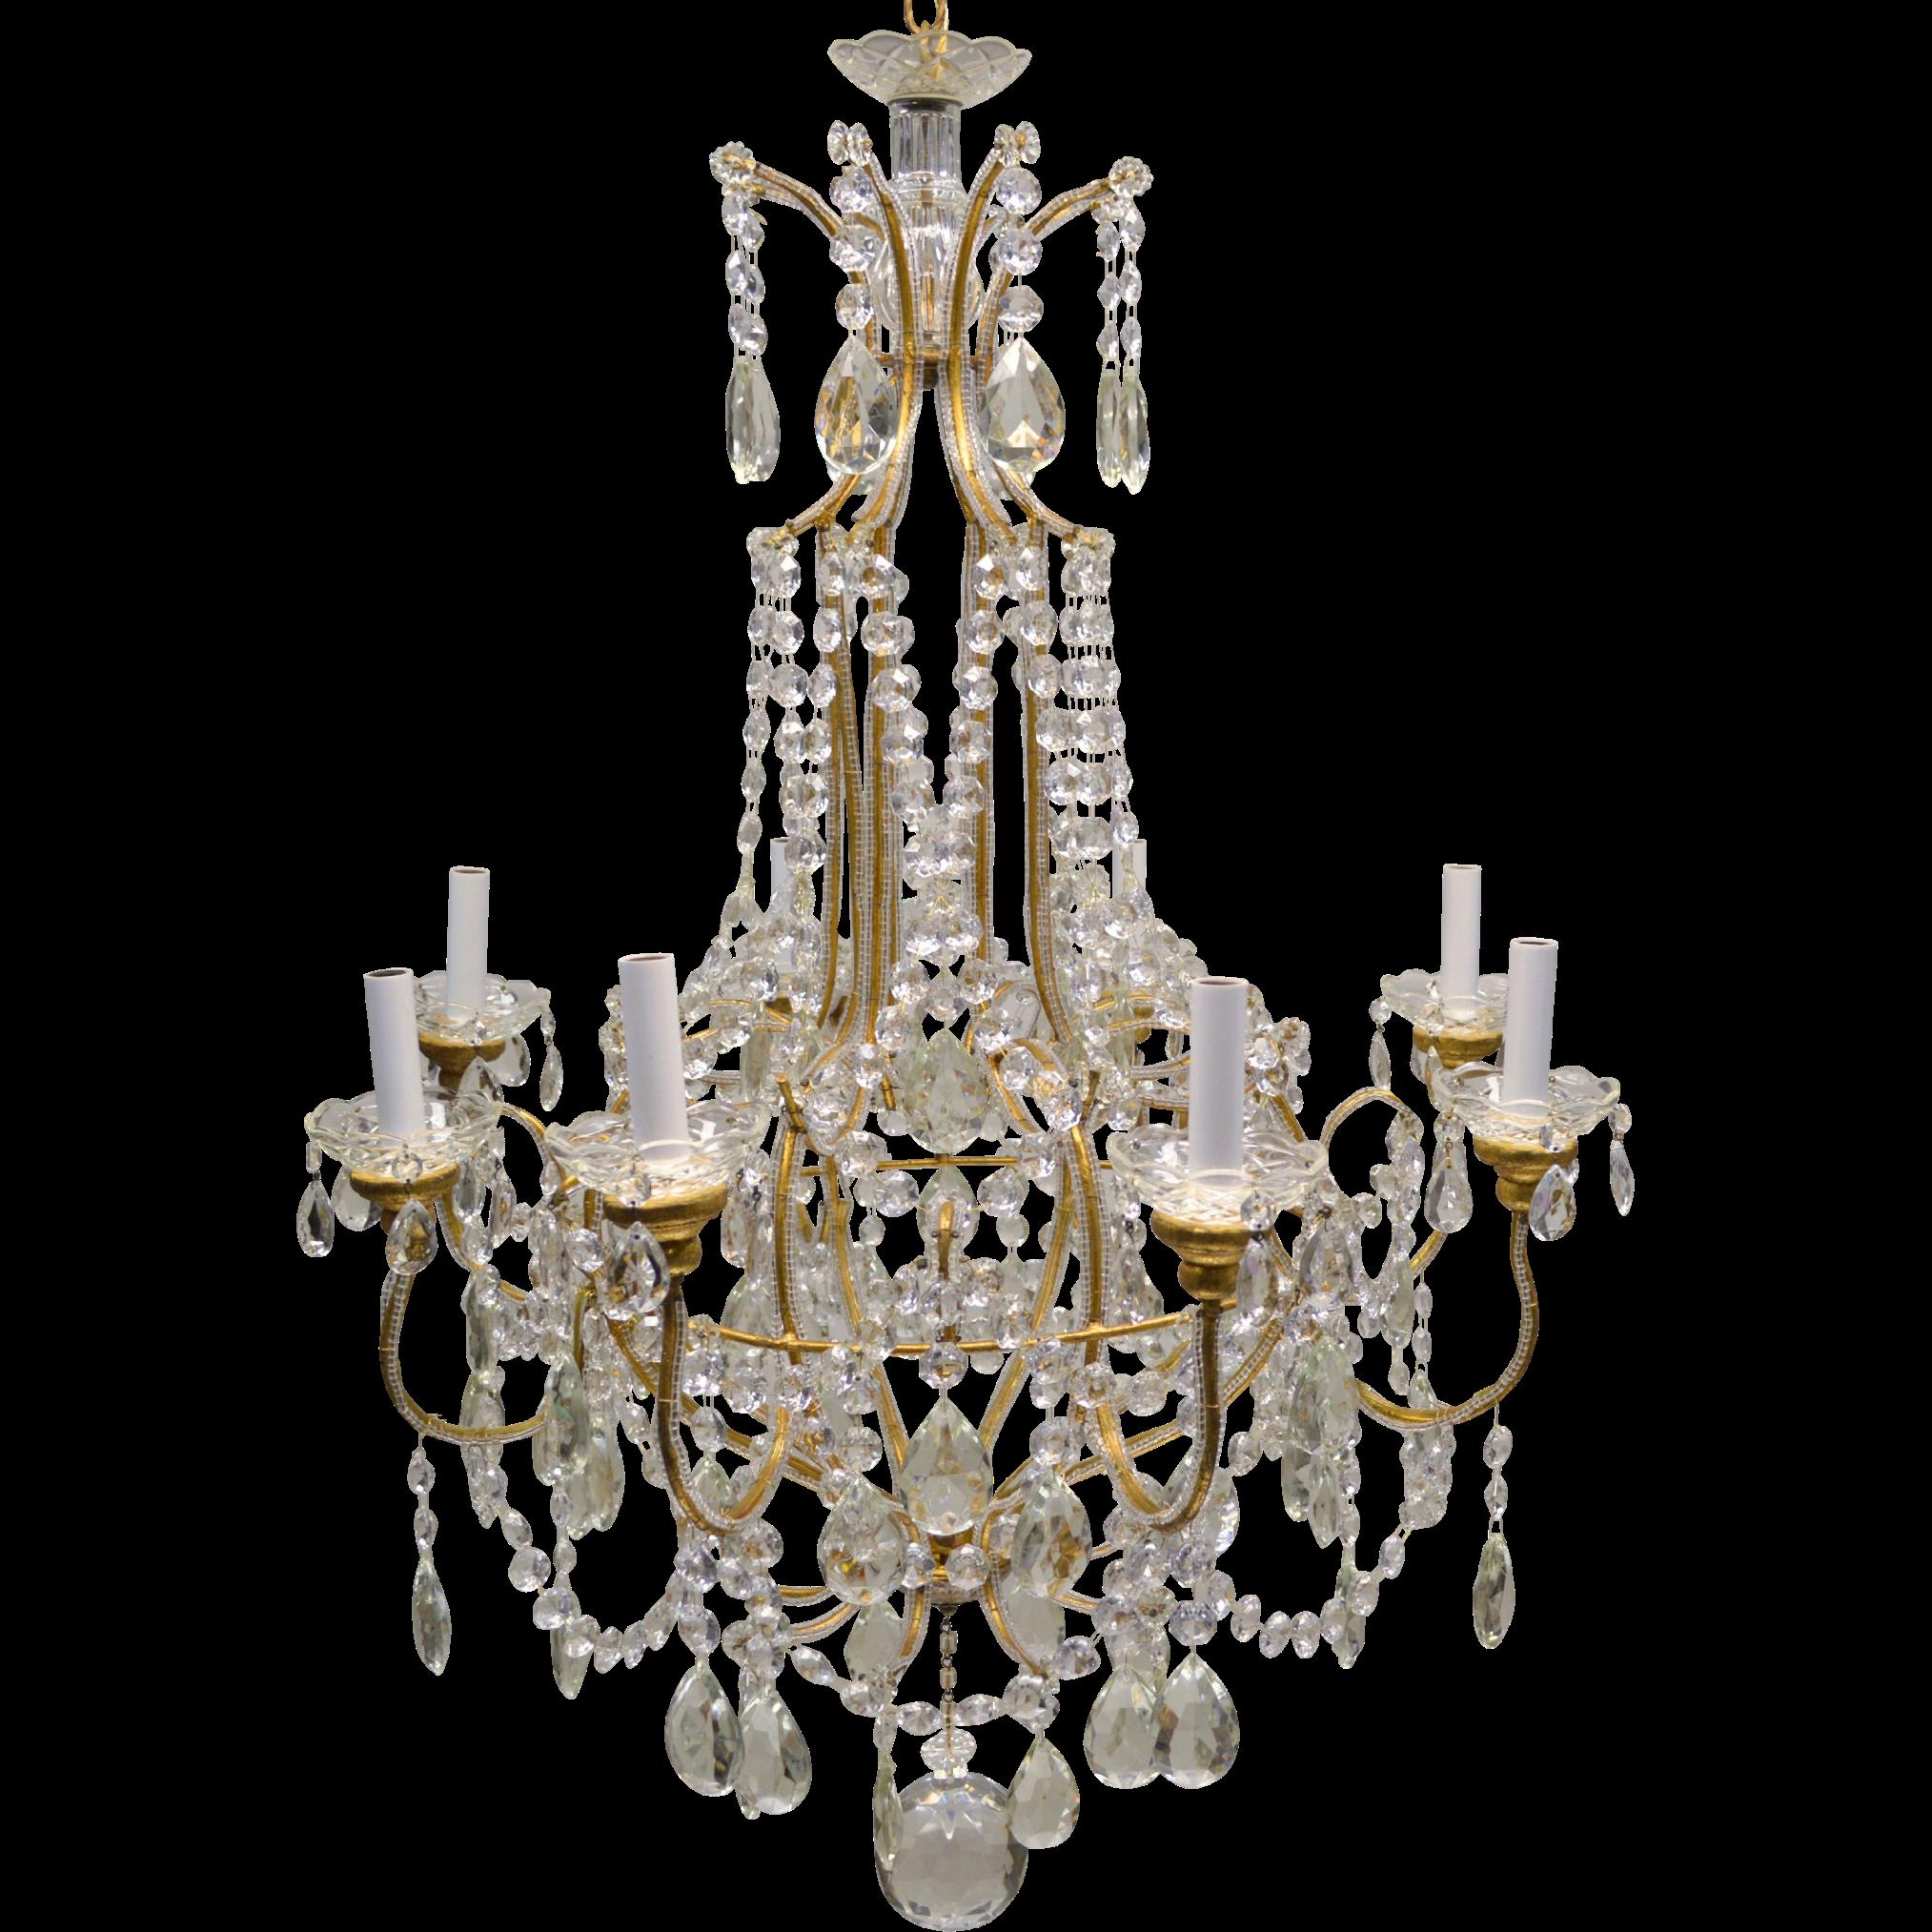 Vintage Italian Gilded Macaroni Beaded Crystal Prism Chandelier - 8 Lights